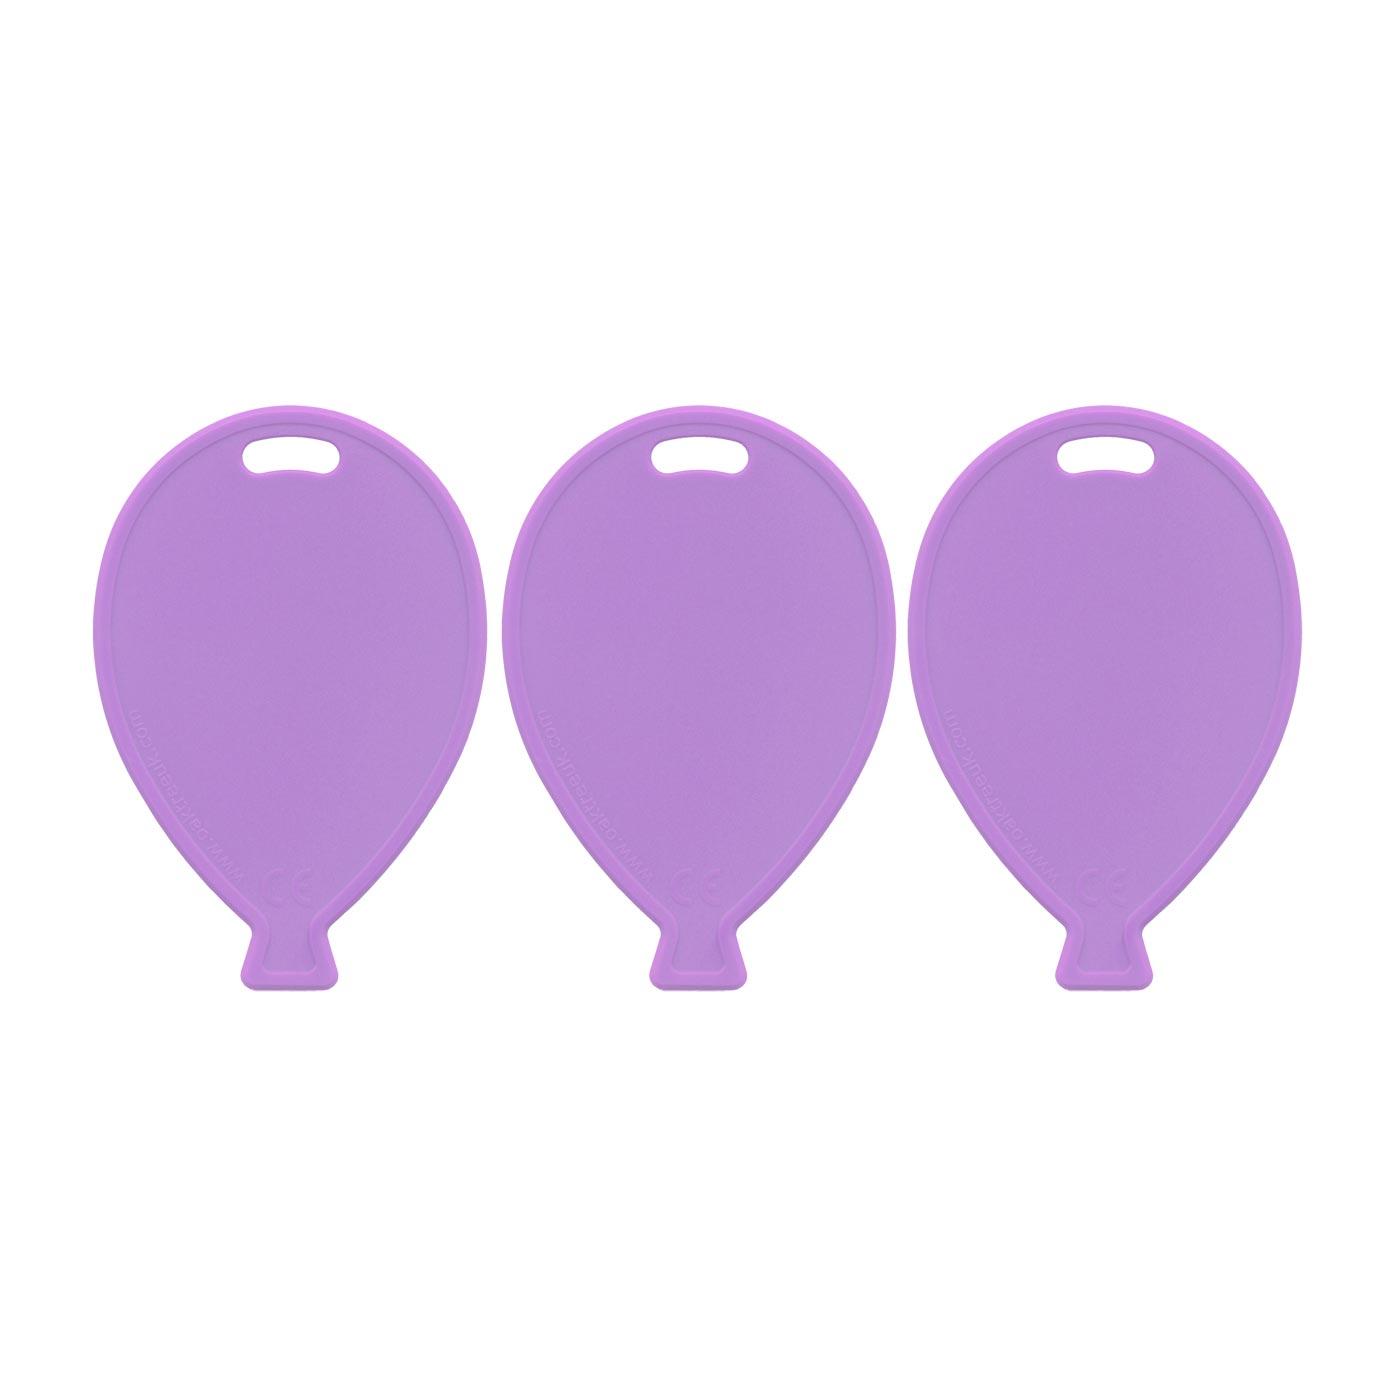 Lilac Balloon Weights